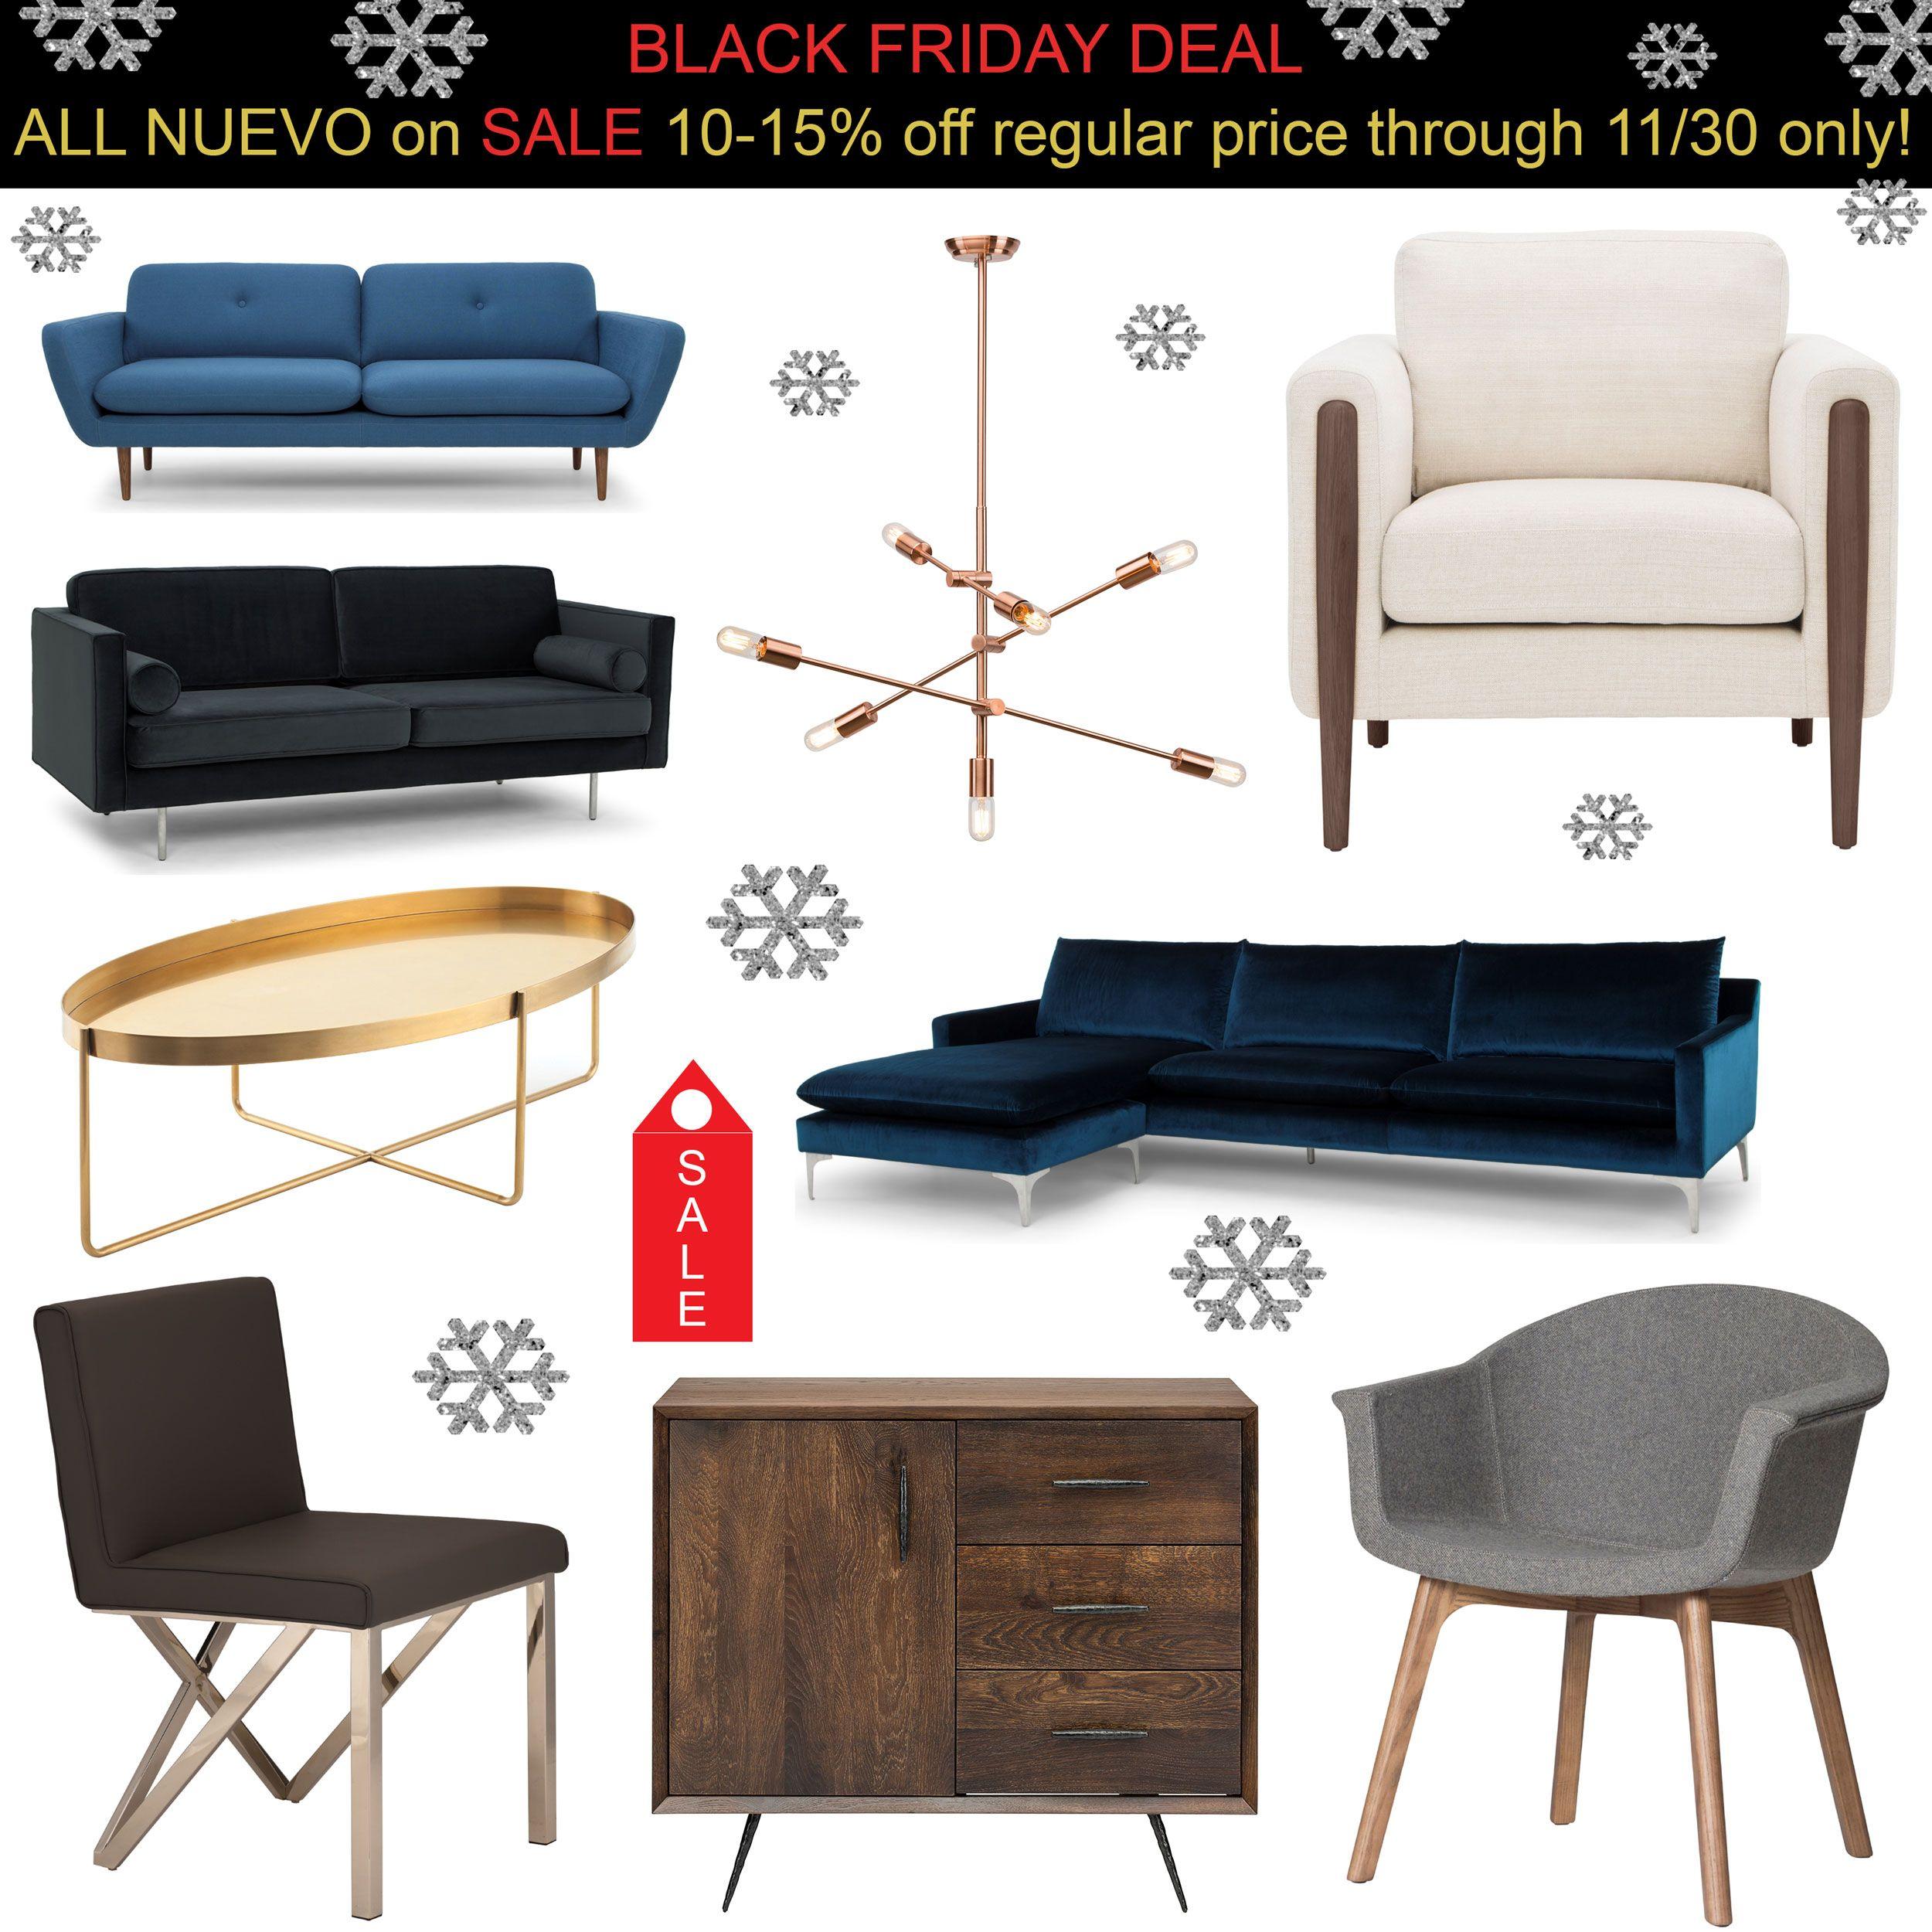 Sensational Black Friday Sale Dynamichome Shopping Furniture Sale Forskolin Free Trial Chair Design Images Forskolin Free Trialorg